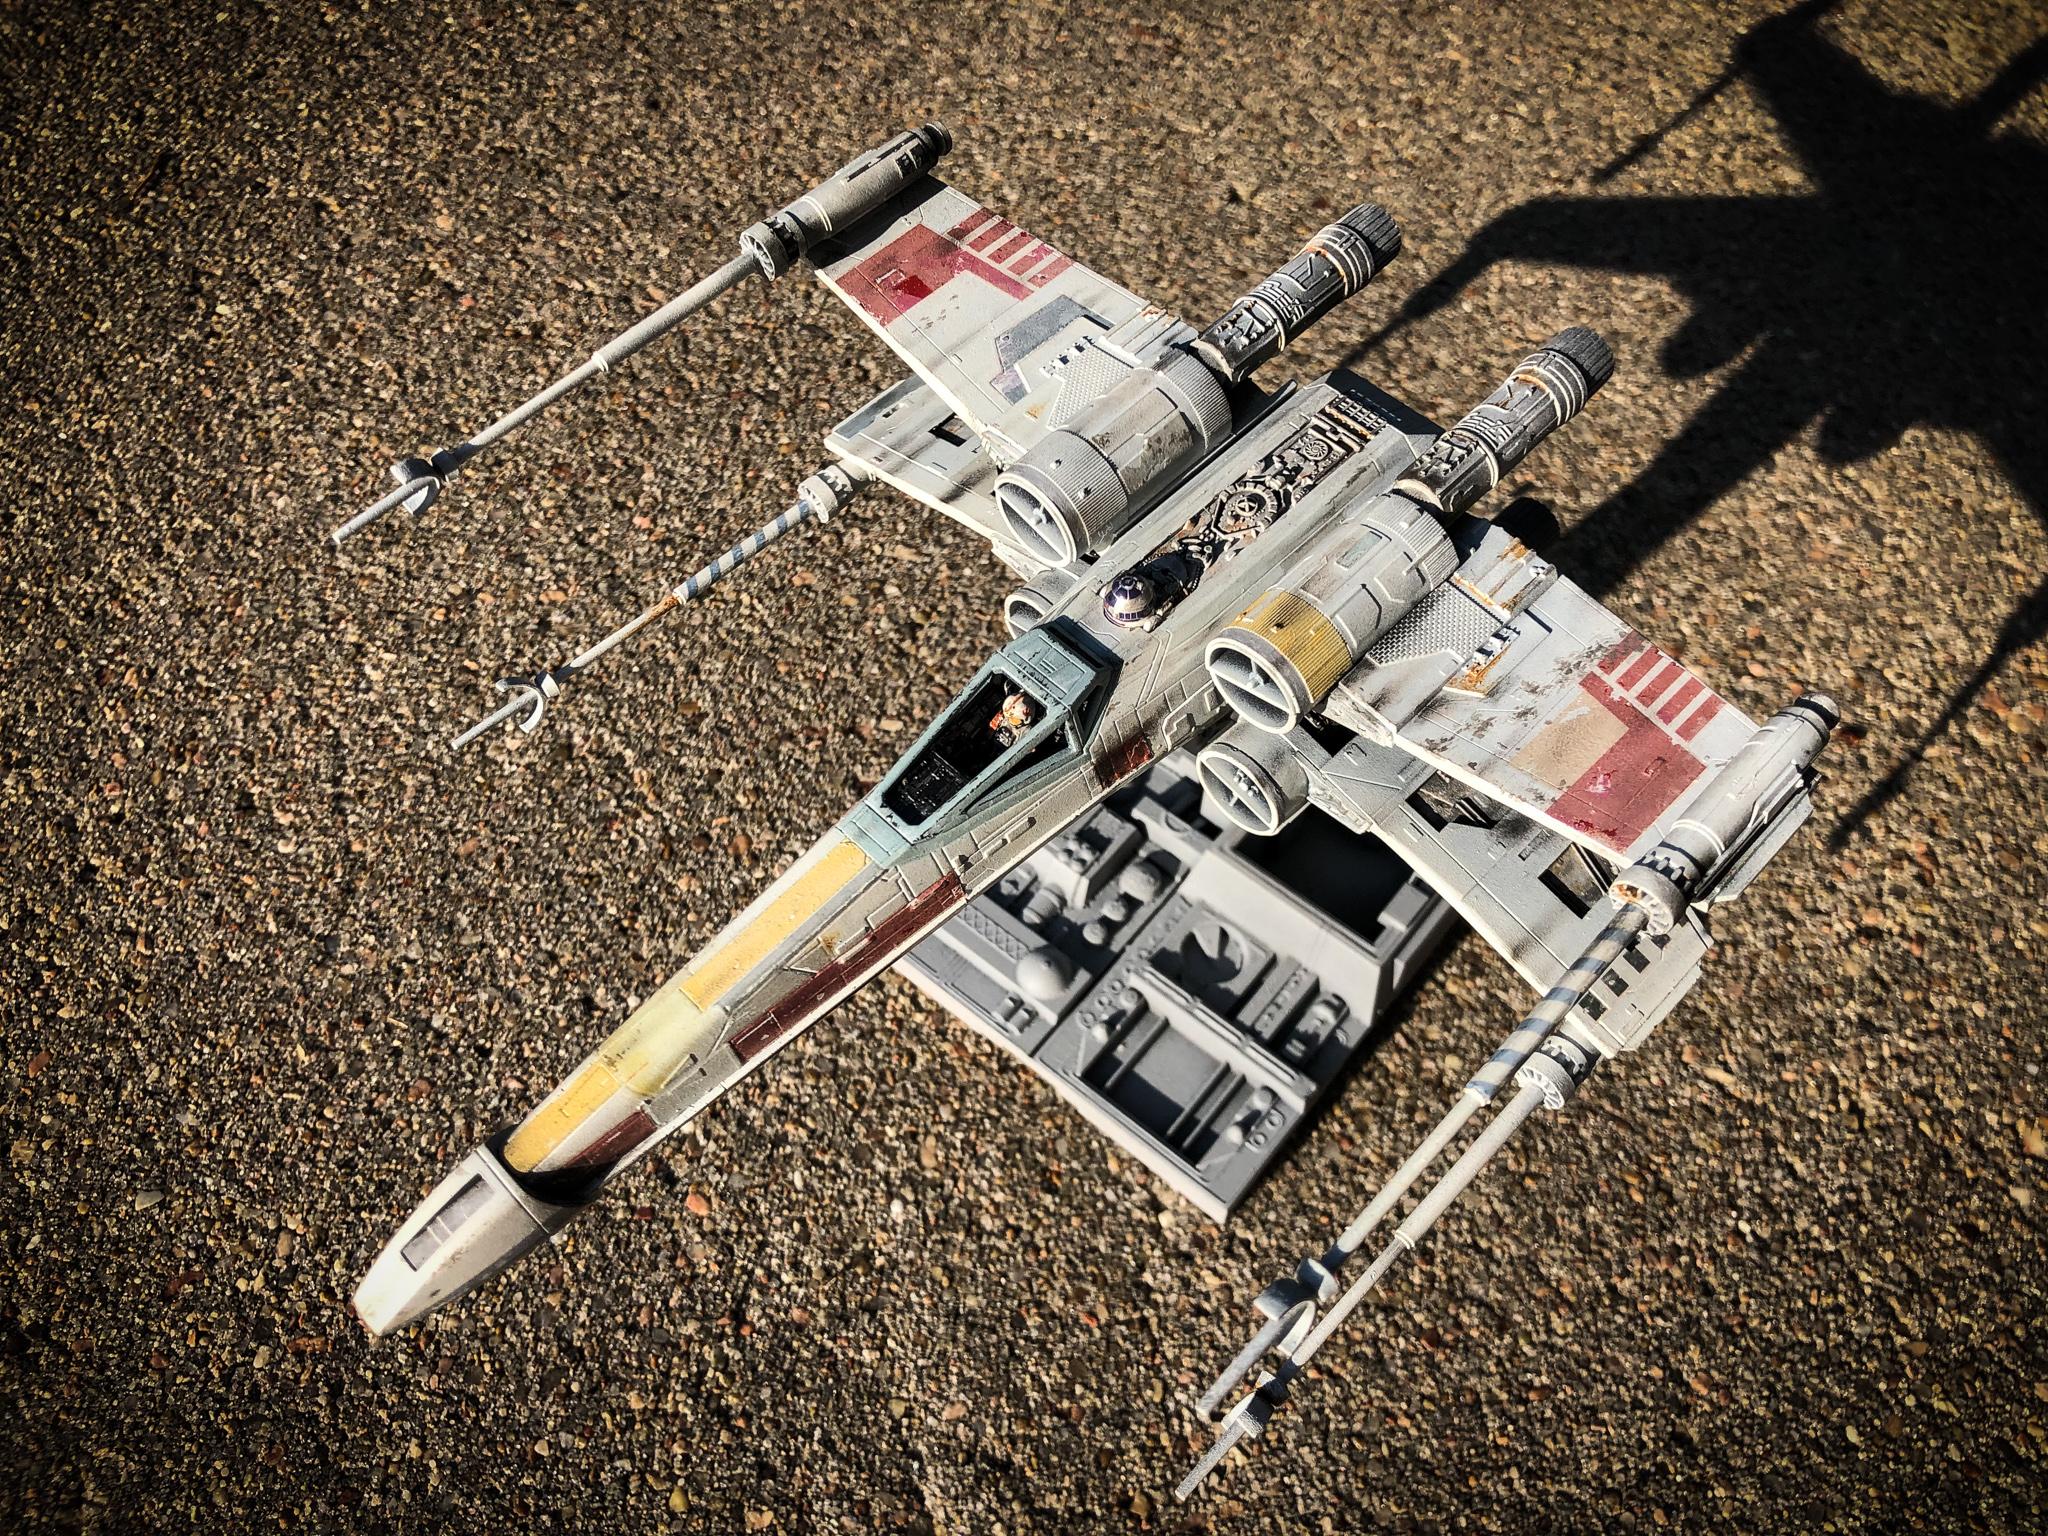 x-wing-20.jpg